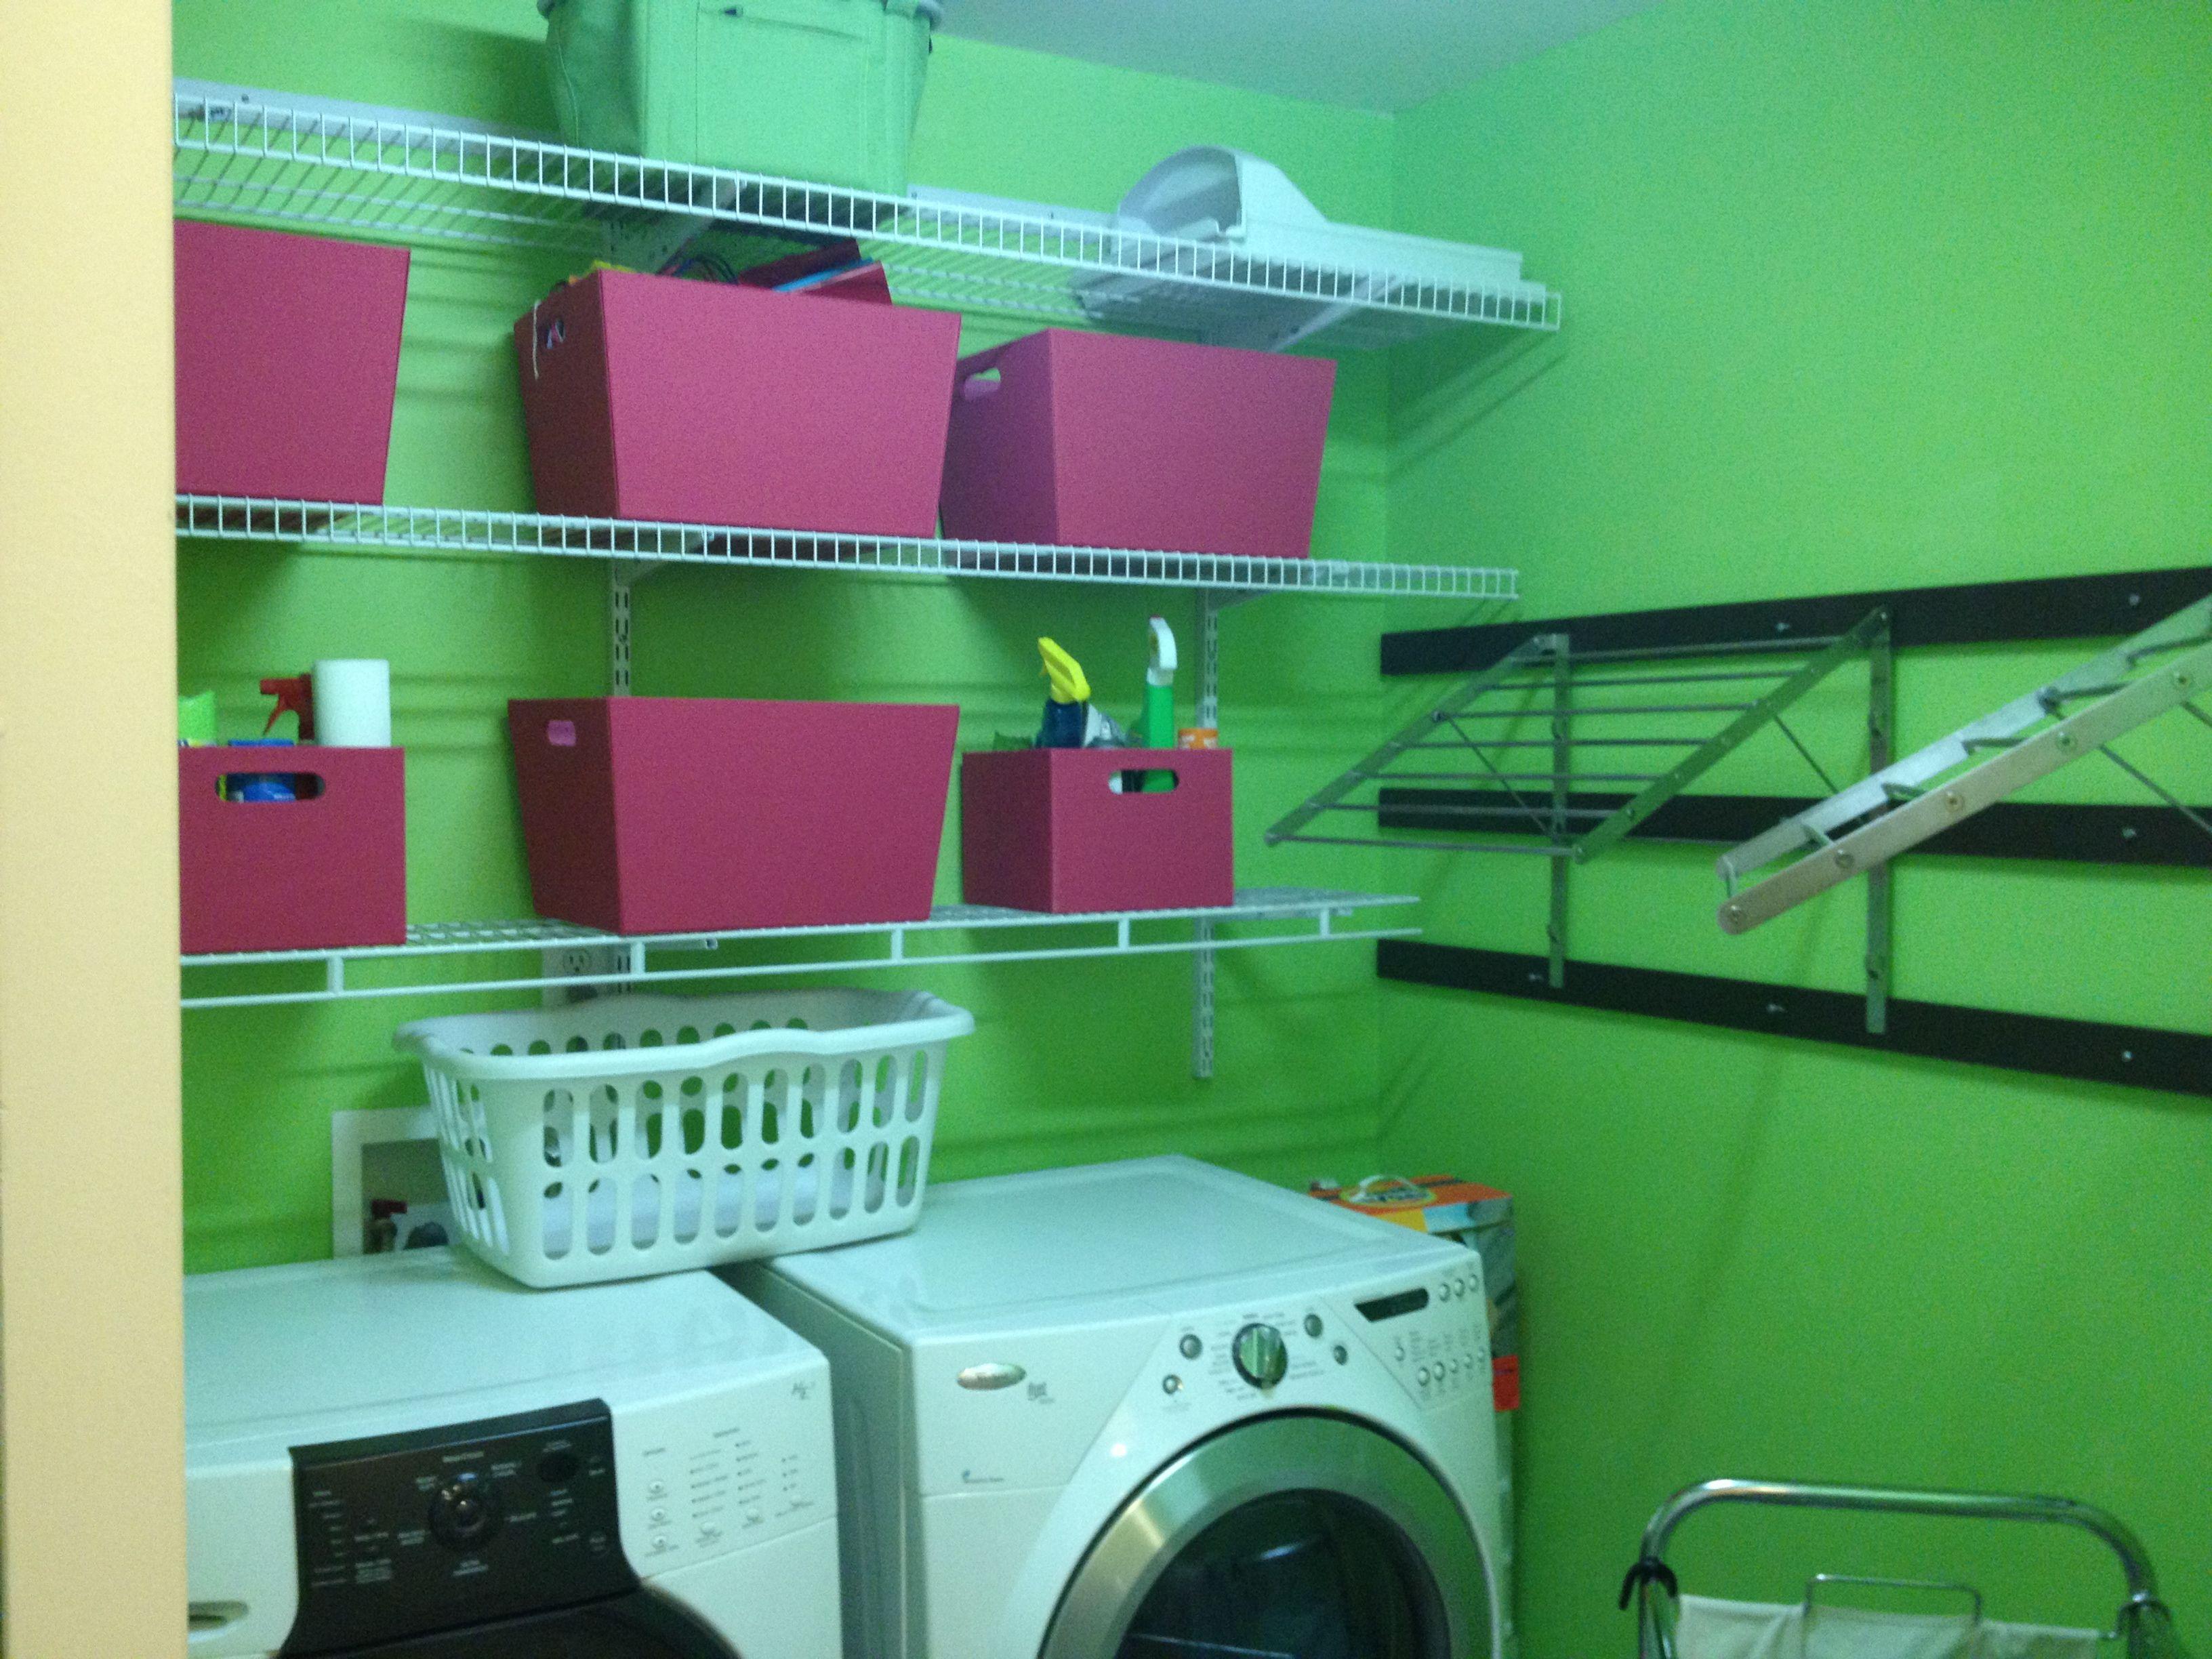 6x Prachtige Bijkeukens : Organized laundry room yay! check! pinterest